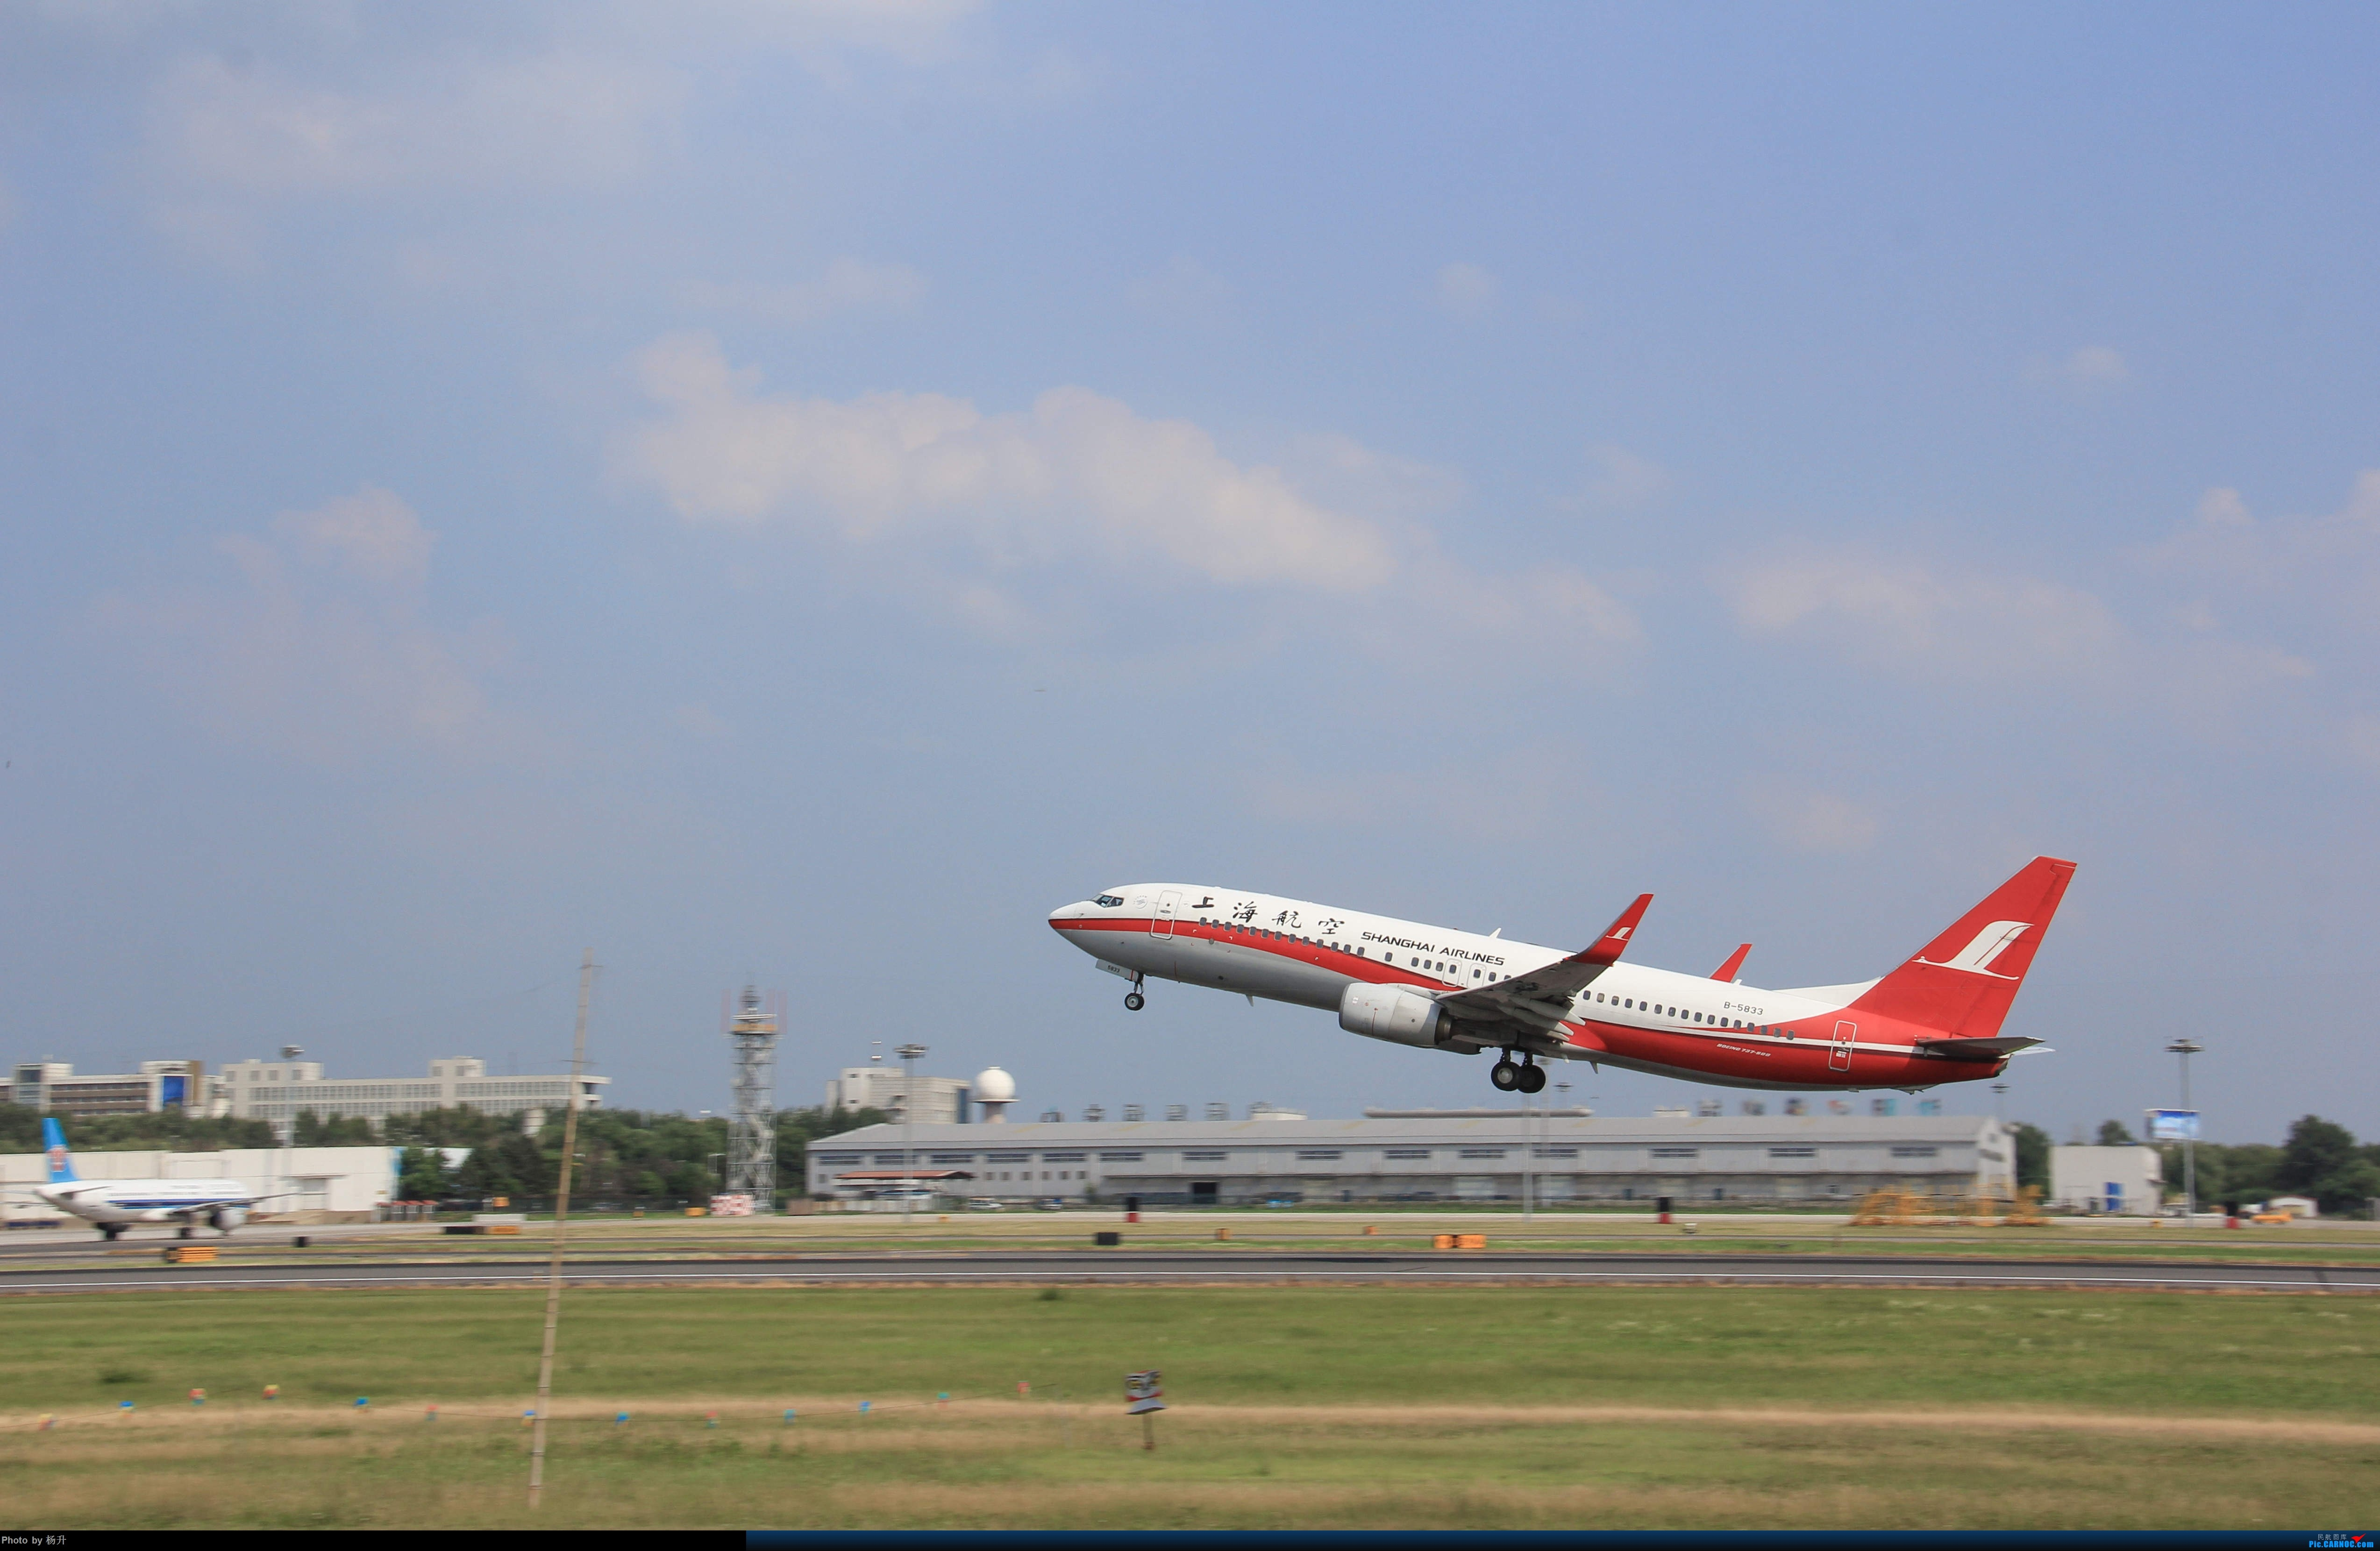 Re:[原创]【SHE】沈阳桃仙国际机场拍机 BOEING 737-800 B-5833 中国沈阳桃仙国际机场